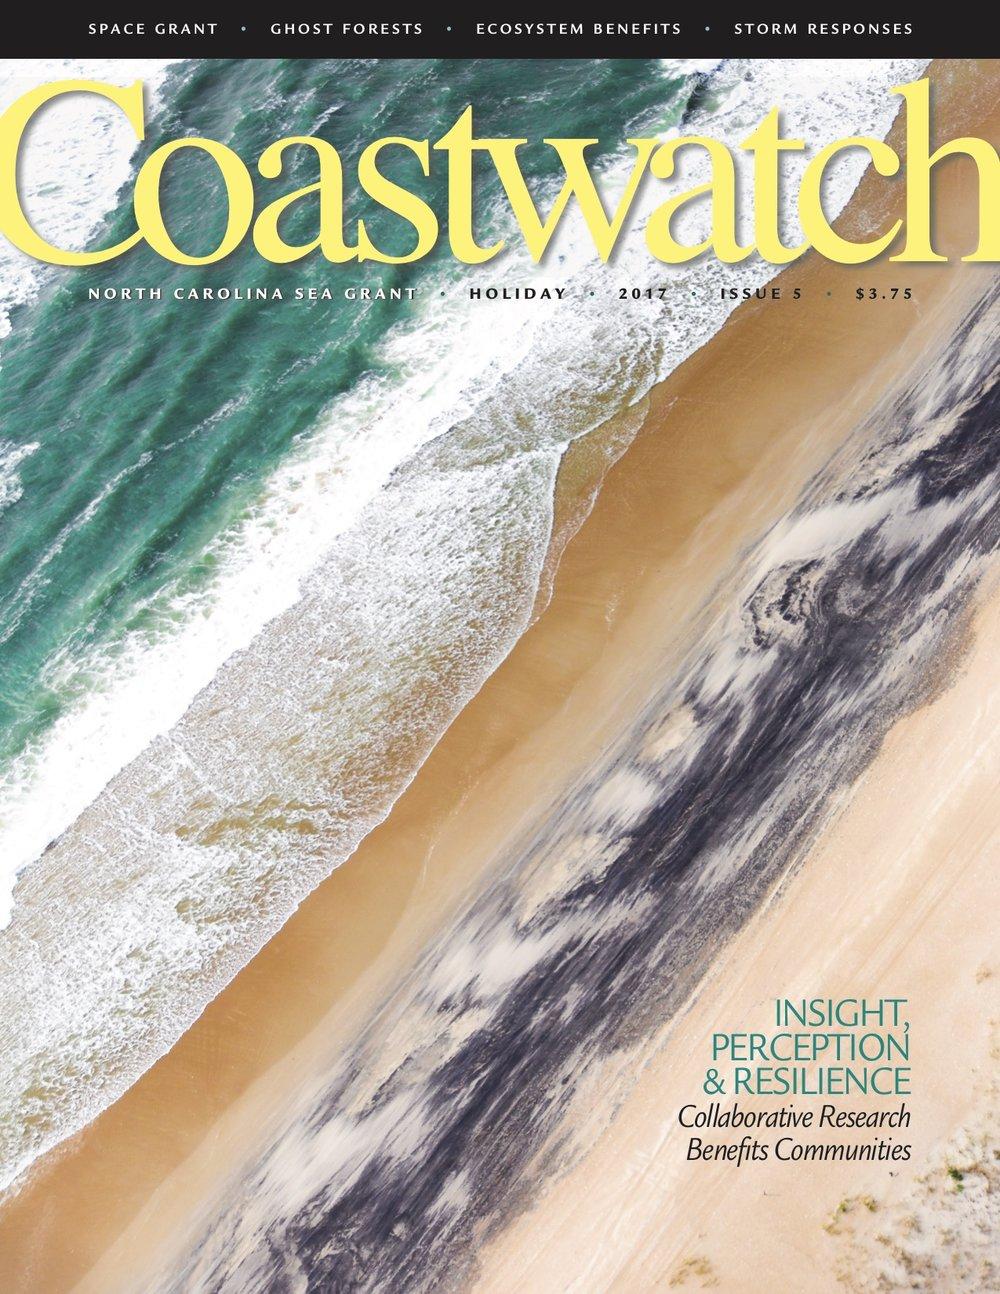 Coastwatch Nov-Dec 2017 cover (1).jpg